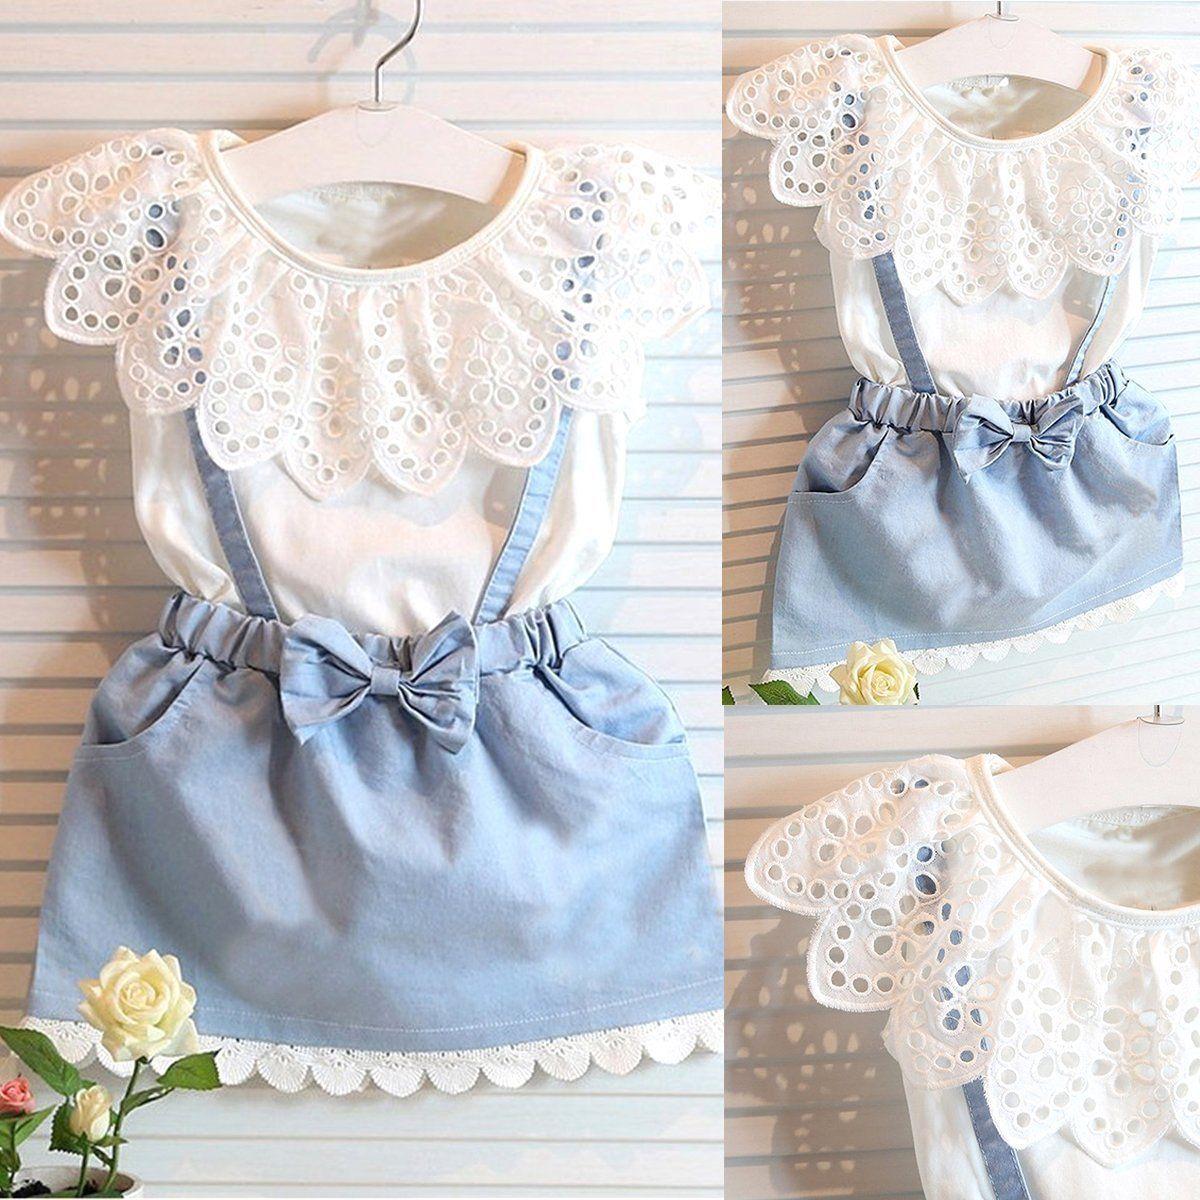 c3a62e96cd47 2Pcs Kids Baby Girl Toddler Summer Clothes T-Shirt Tops+Denim Skirt Outfits  Sets